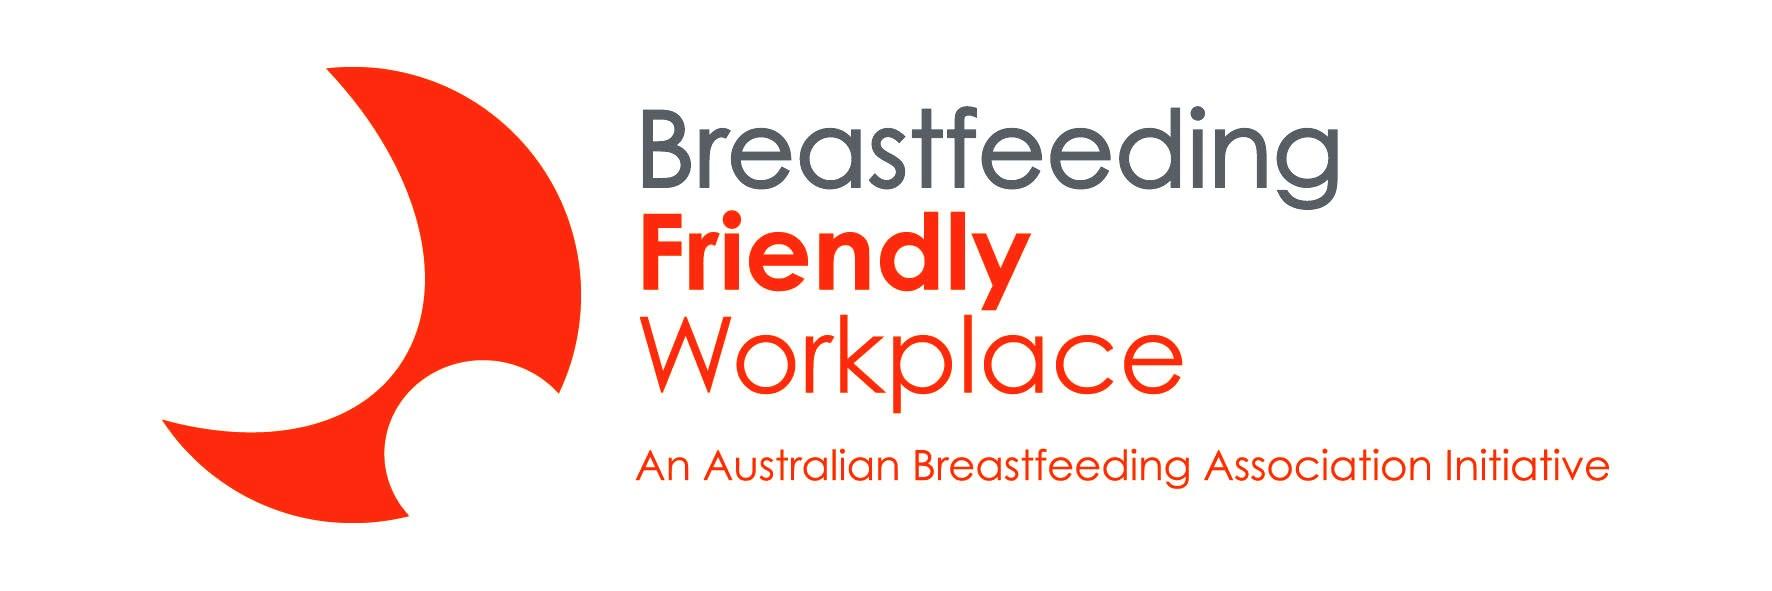 Breastfeeding friendly workplace. An Australian Breastfeeding Association Initiative